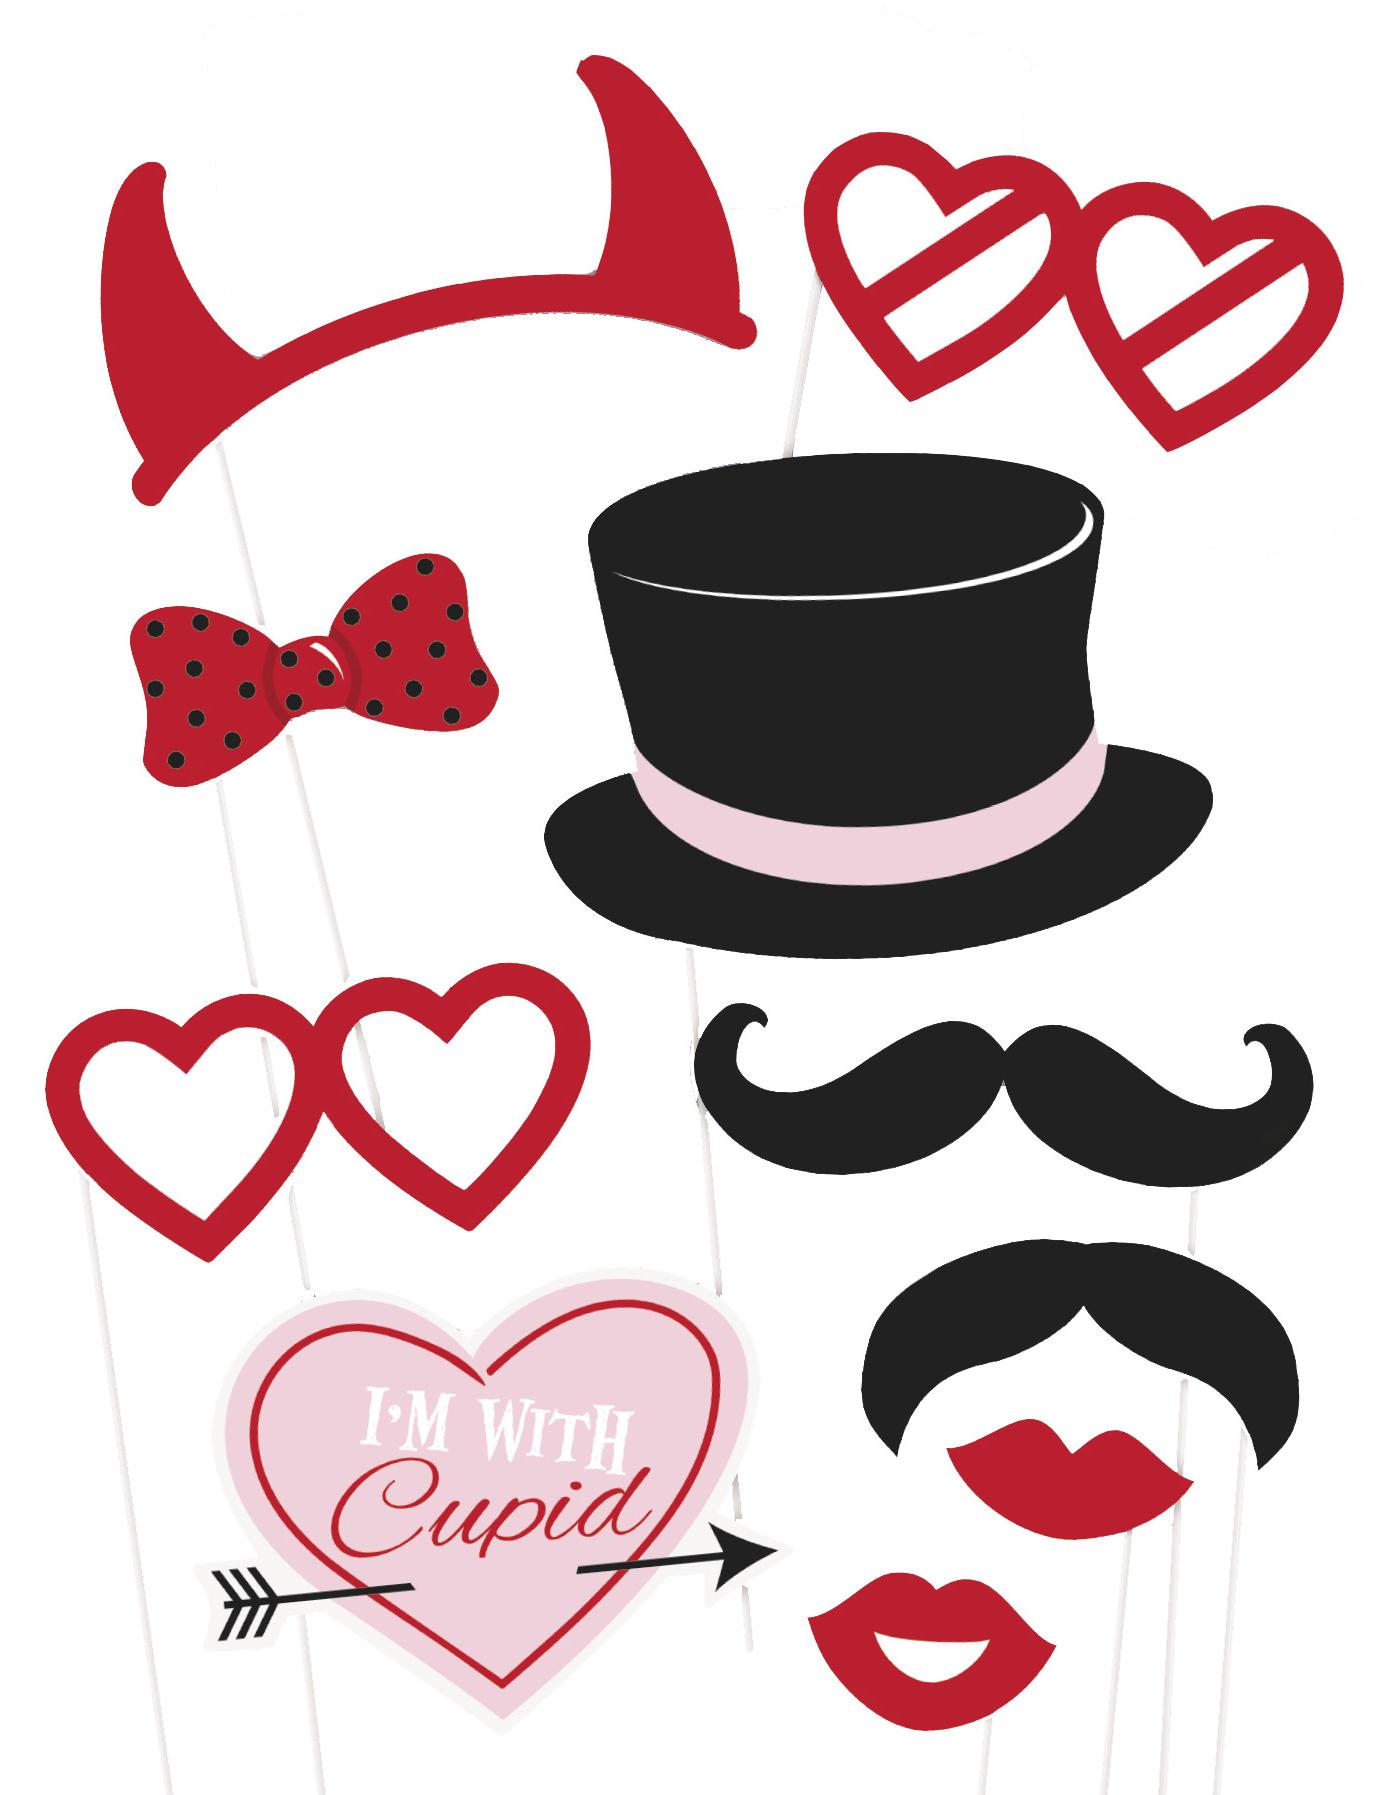 #Photobooth Set St Valentin#